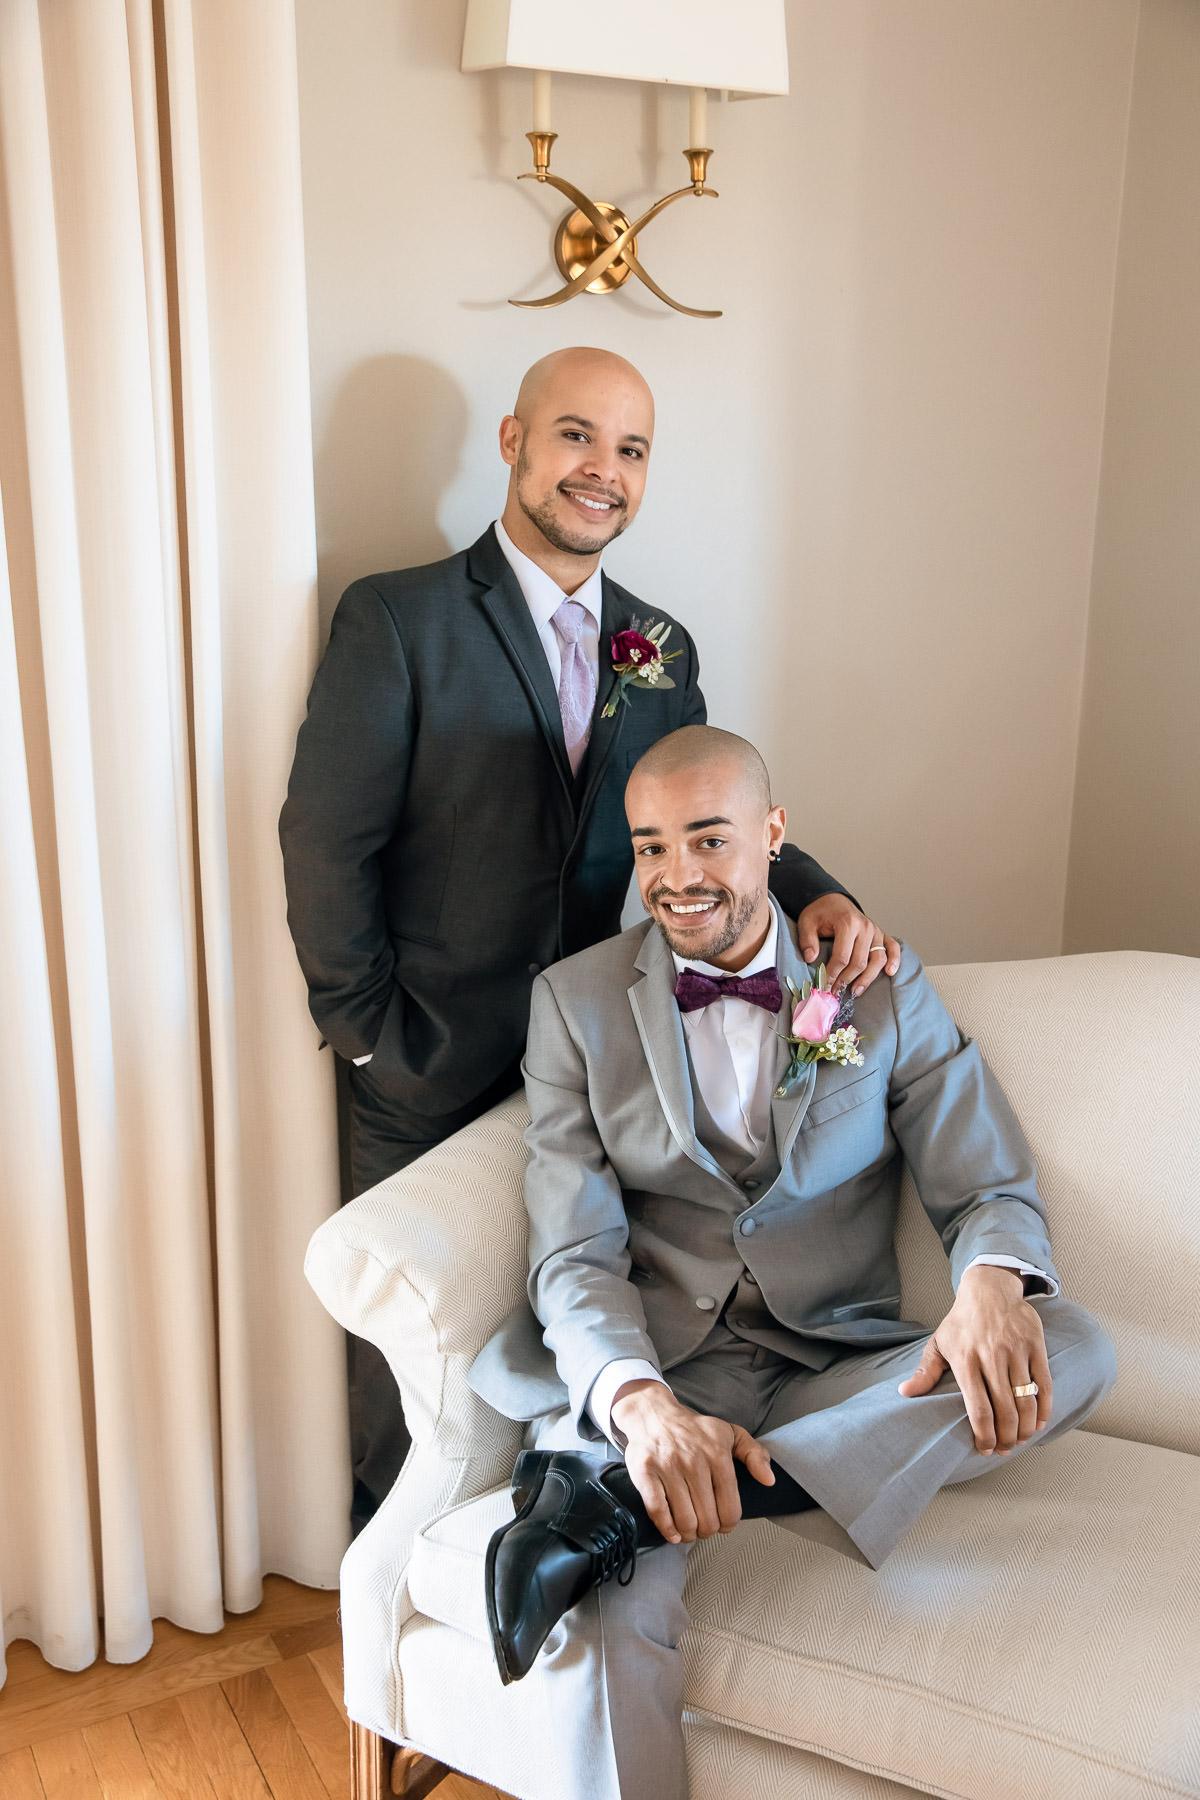 Eisenhower House, Newport, Rhode Island, Tracy Jenkins Photography, wedding, LGBTQ+, LGBT, Gay, Inclusive, Photography, Wedding photography, groom, grooms, couch